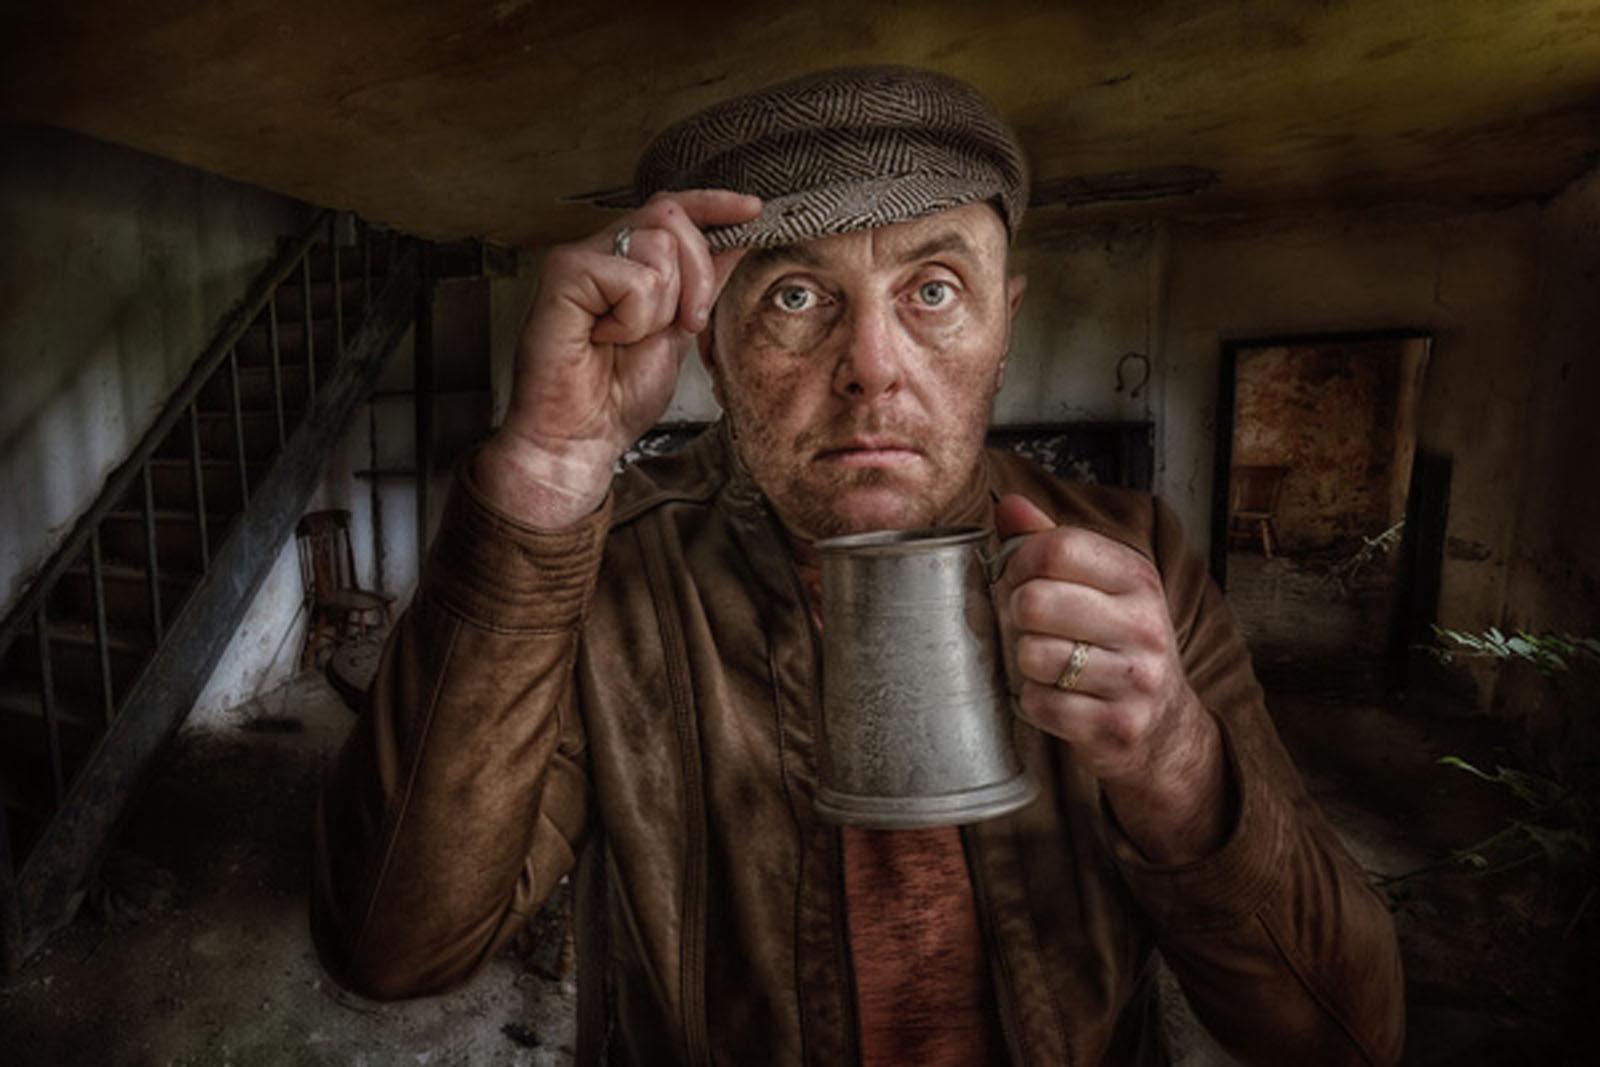 COLOUR - Tavern Man by Vadim Lee (20 marks)